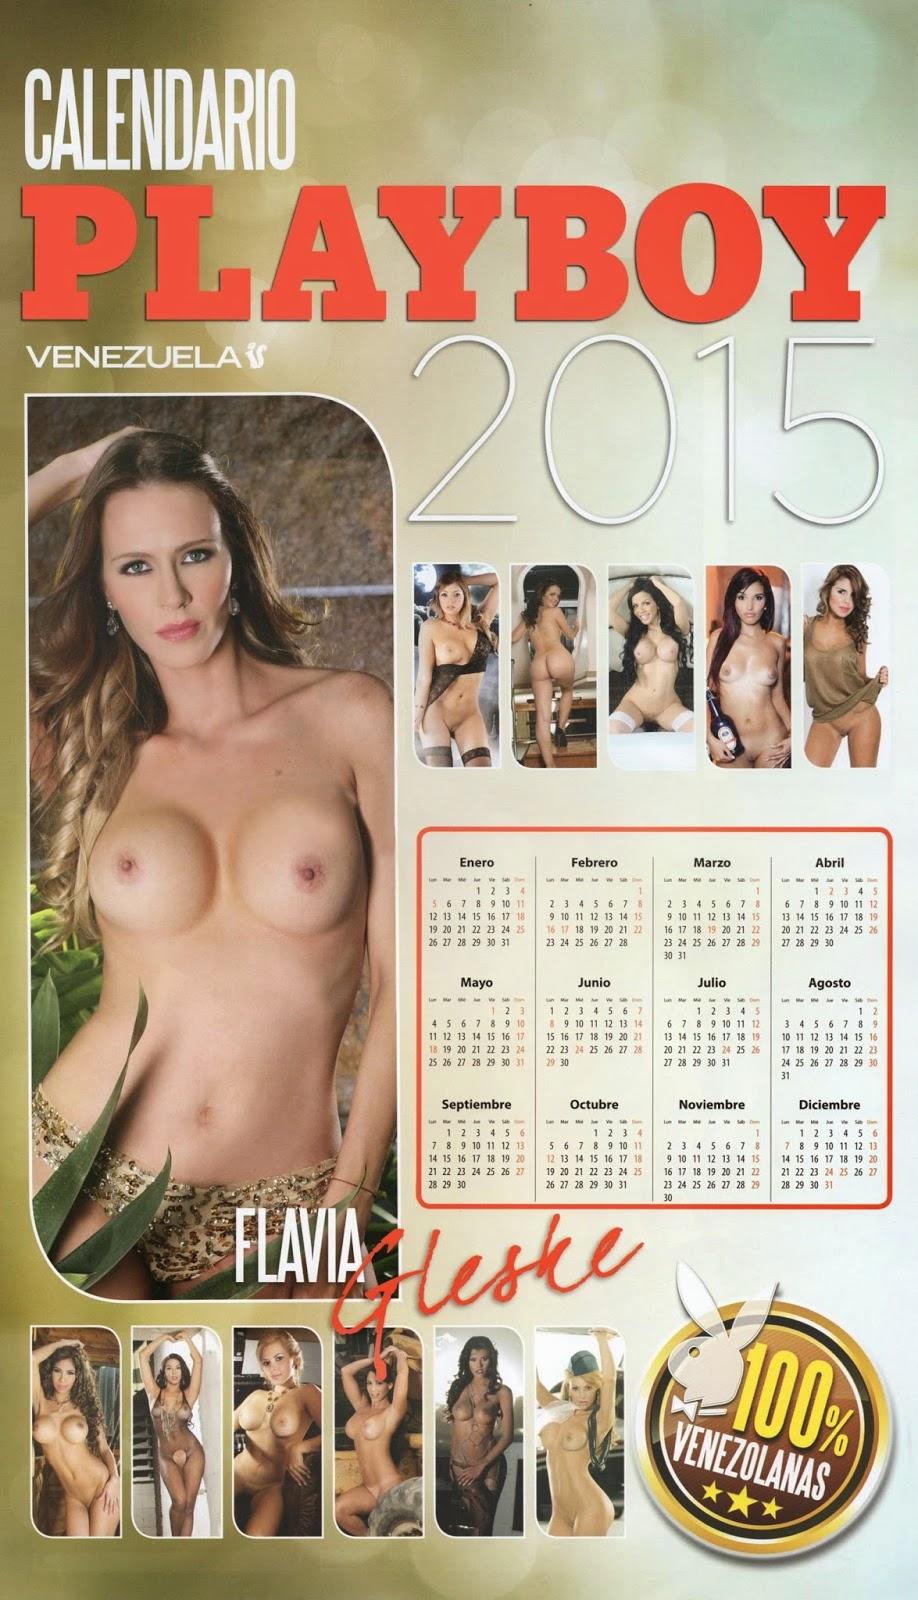 Playboy Official Calendar Venezuela 2015